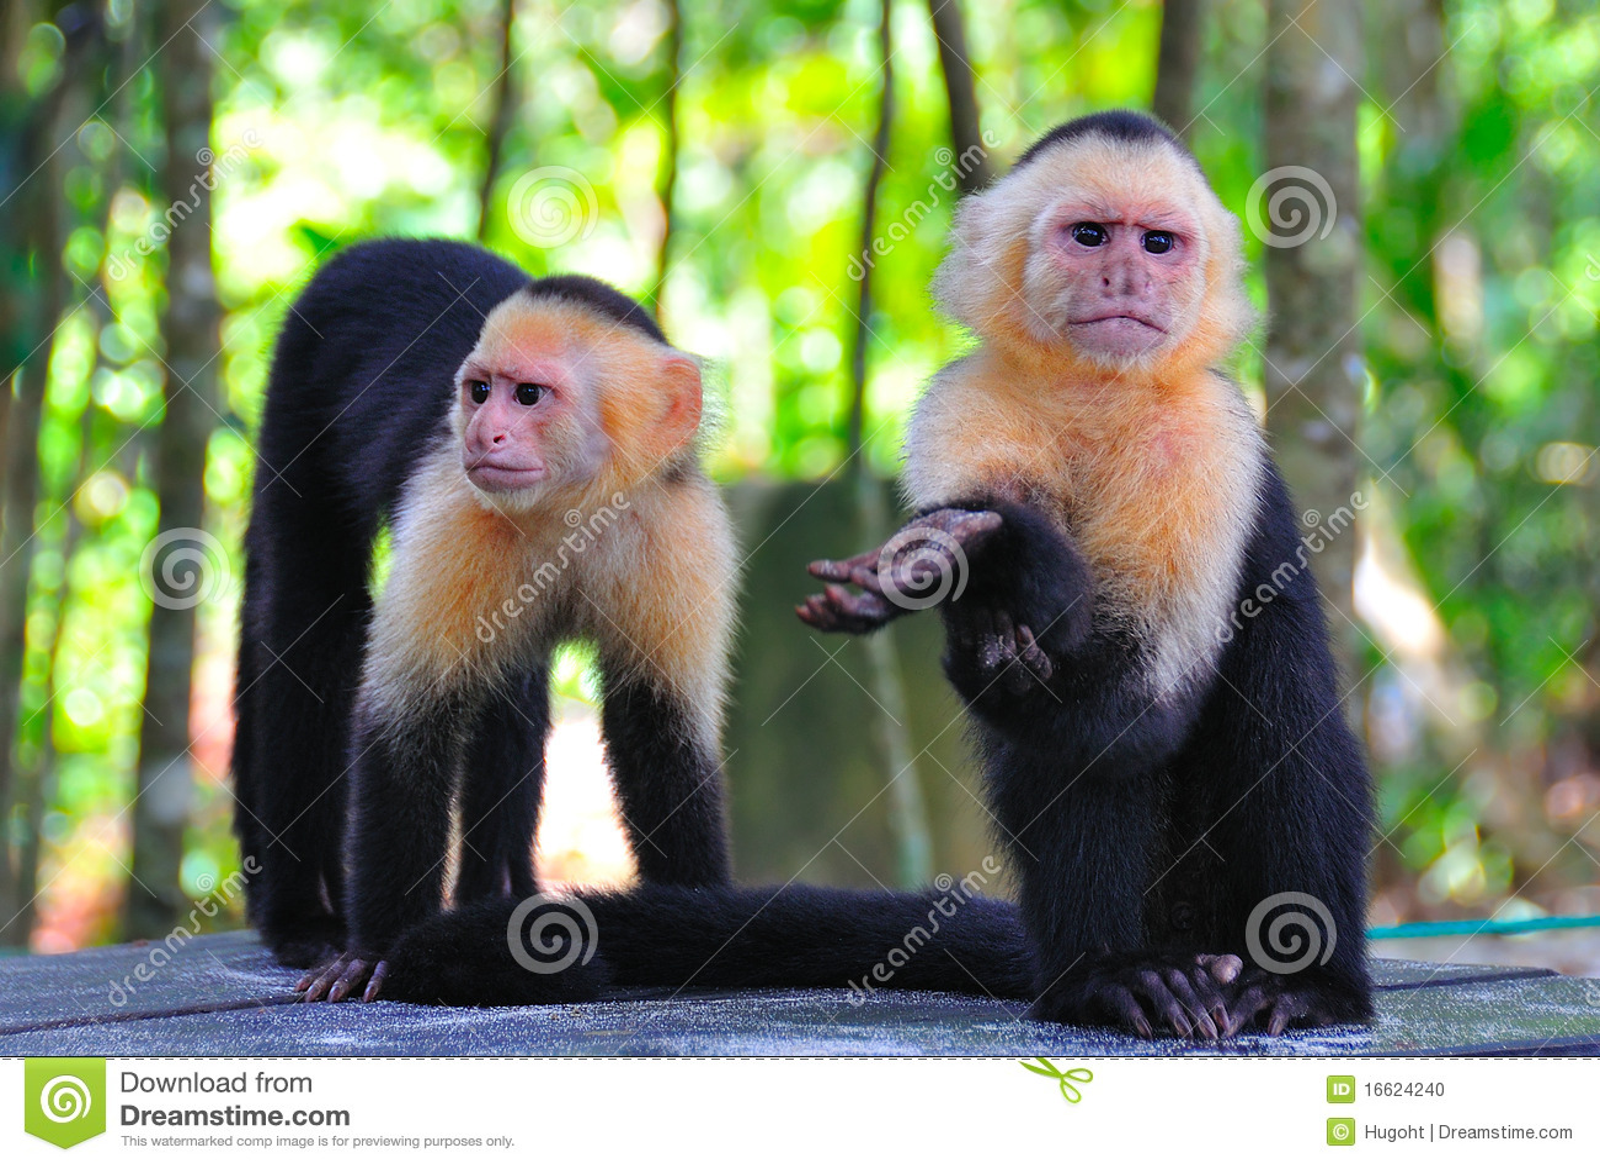 Spider Monkeys, Costa Rica Stock Photo - Image: 16624240